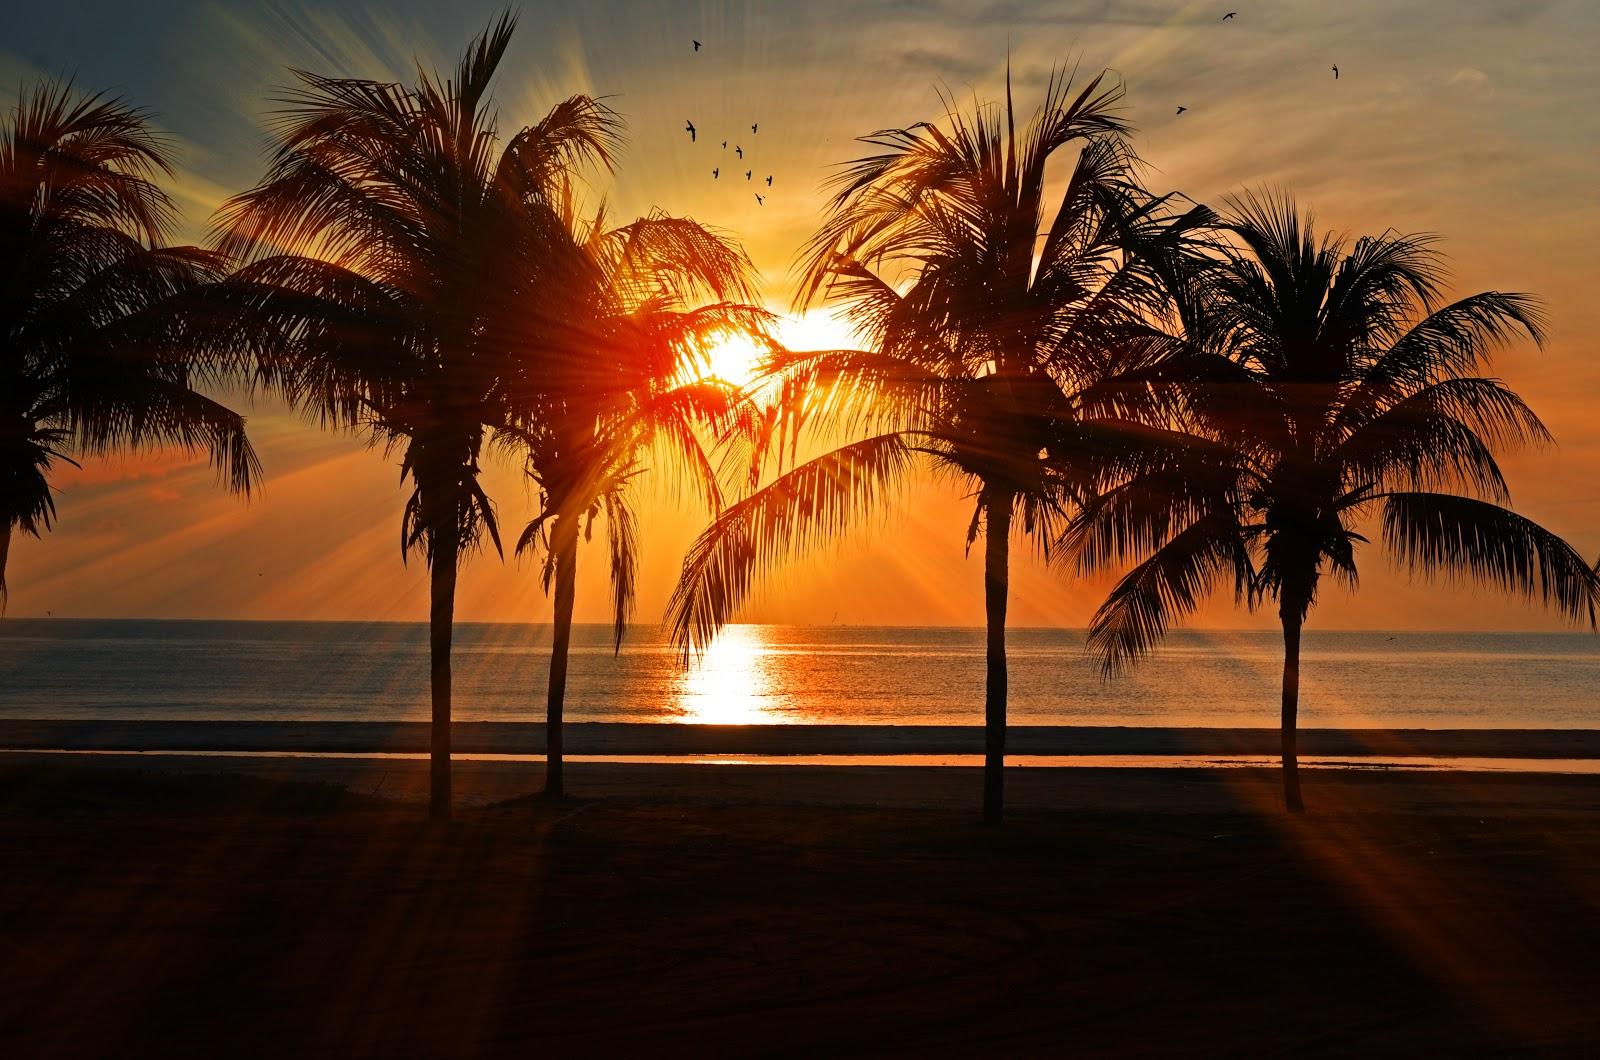 Summer palm trees setting sun